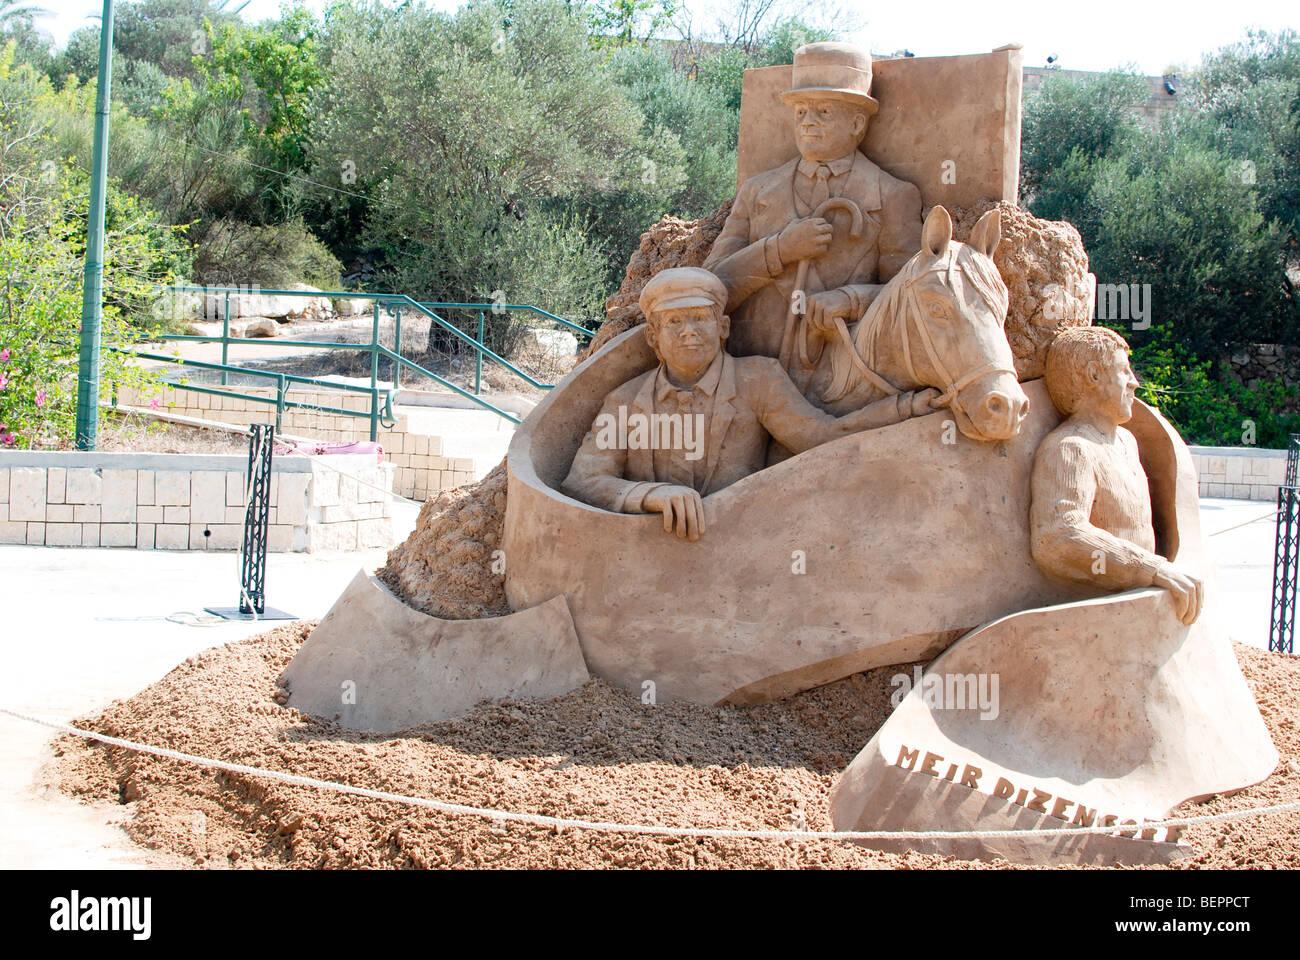 Tel Aviv, Centennial celebrations, sand sculptures of famous buildings and landmarks Meir Dizengoff on his horse - Stock Image